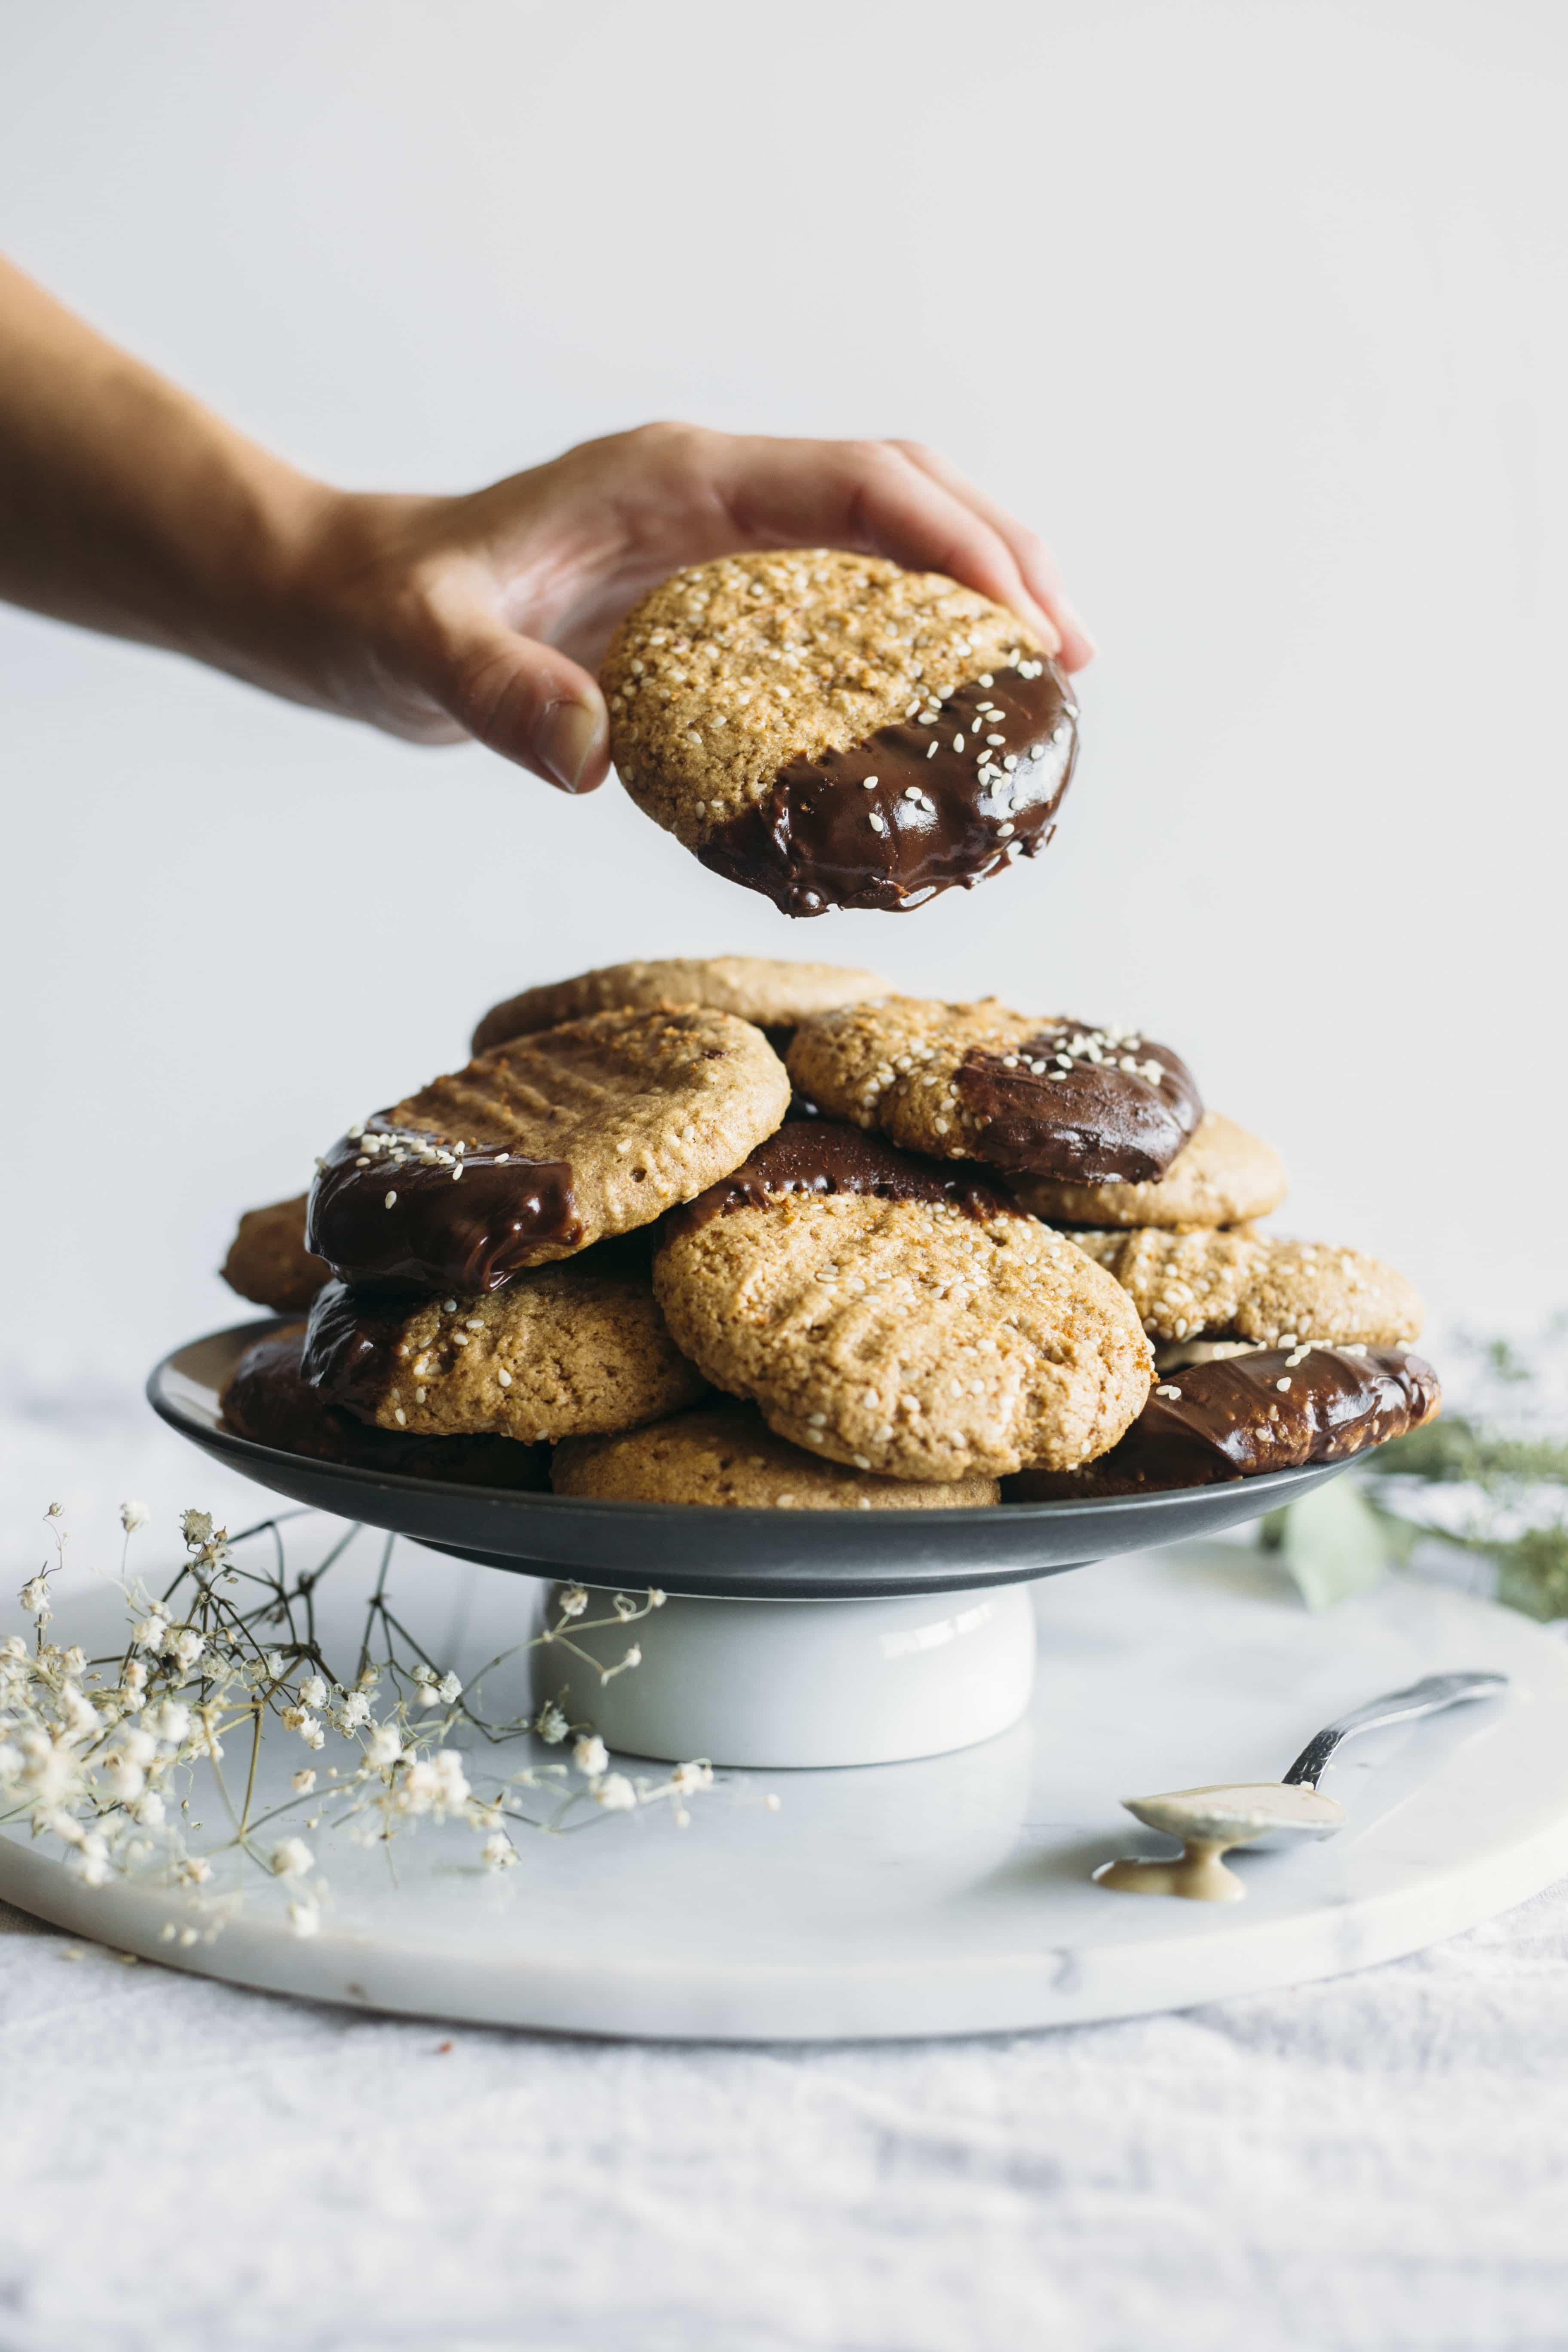 Chocolate Dipped Tahini Cookies | Tahini cookies plus chocolate is a dessert you gotta try for yourself!